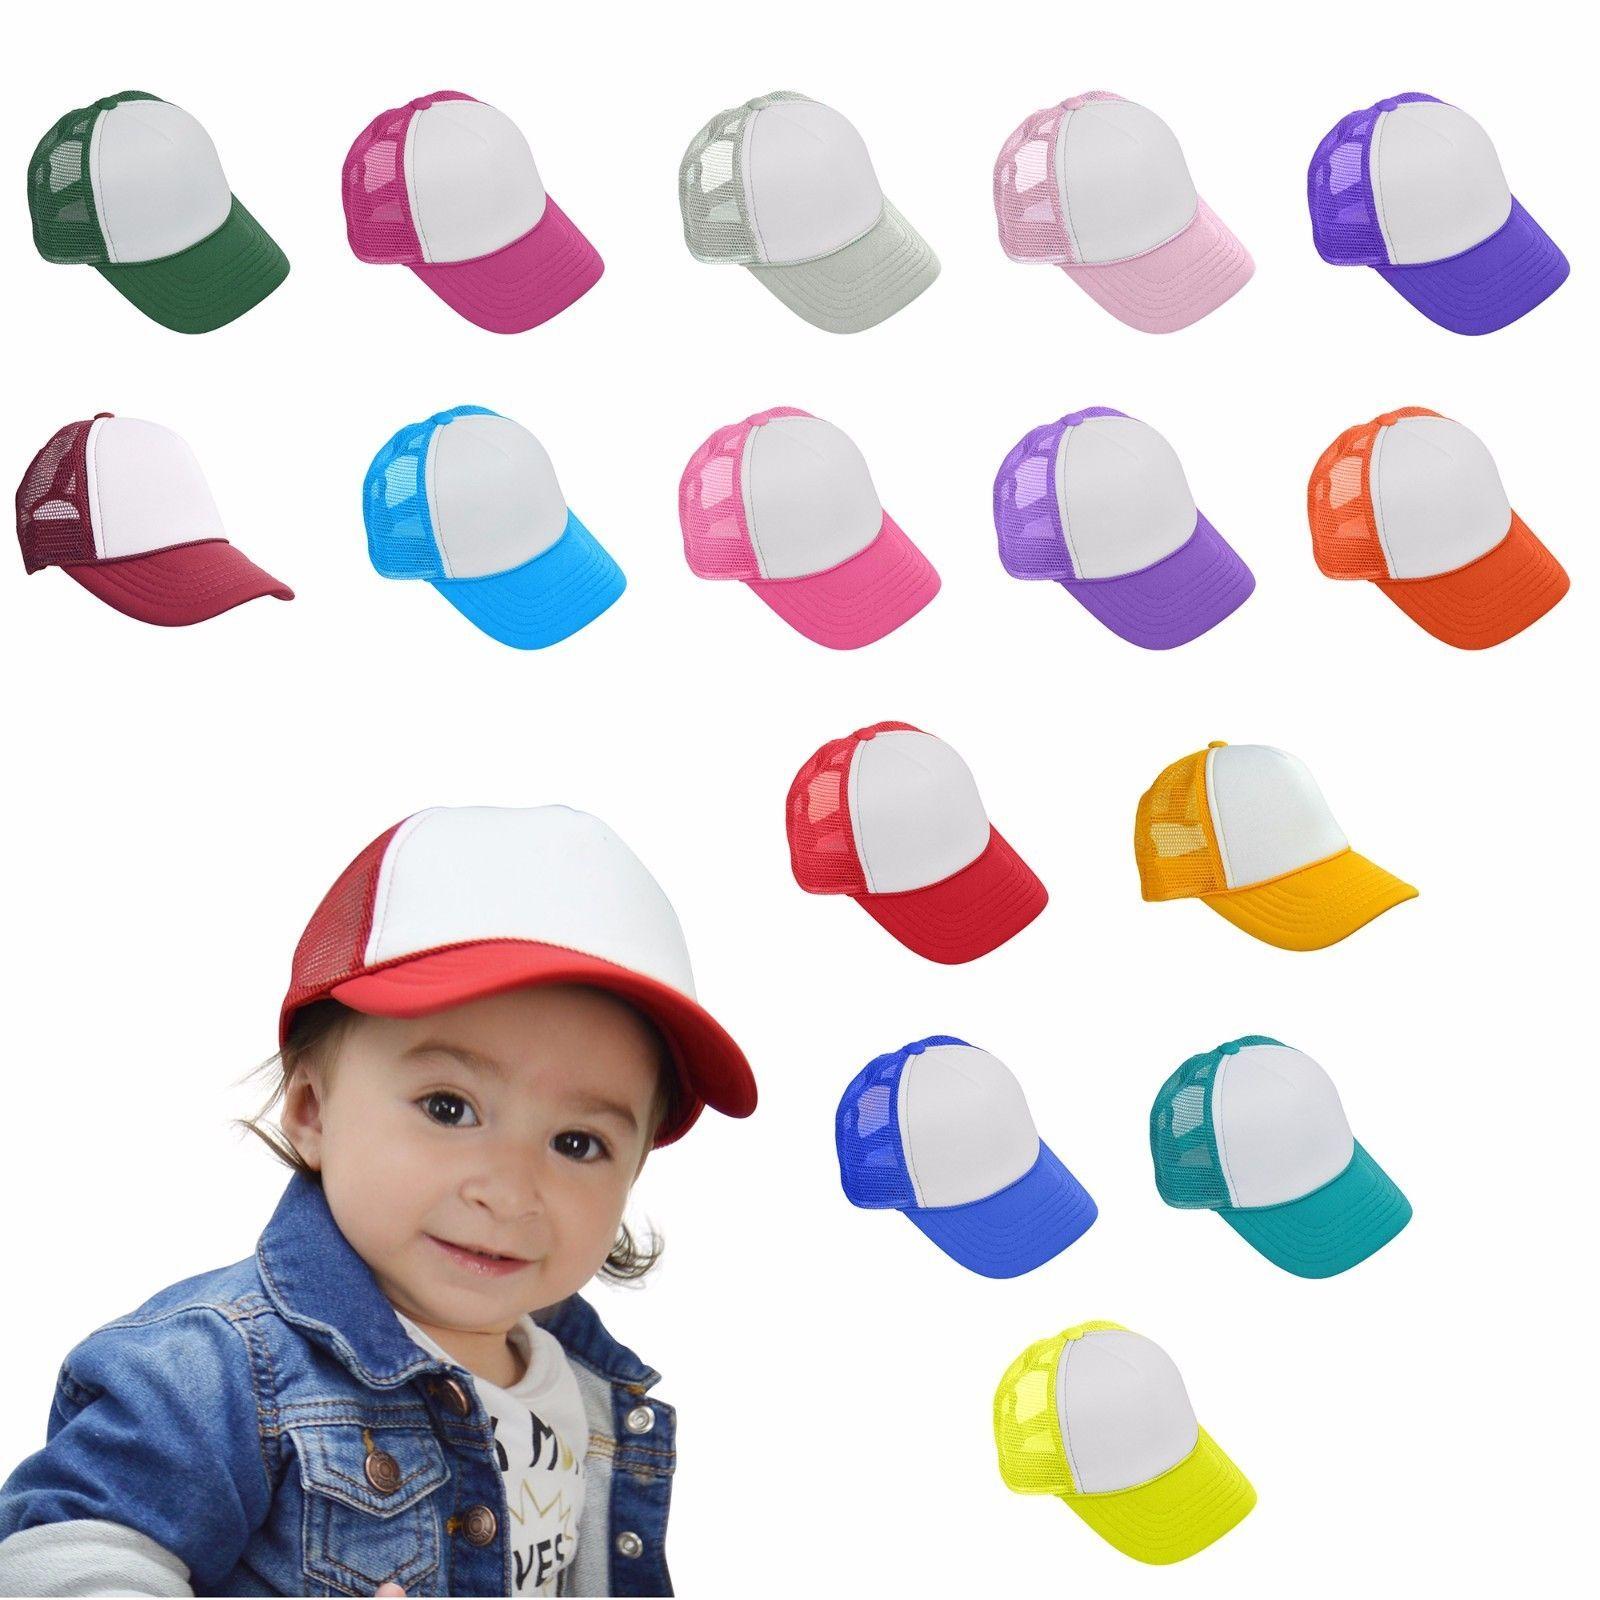 7658acbaf12 2019 Kids Trucker Cap Adult Mesh Caps Blank Trucker Hats Snapback Hats  Girls Boys Toddler Cap GGA326 From Kids dress